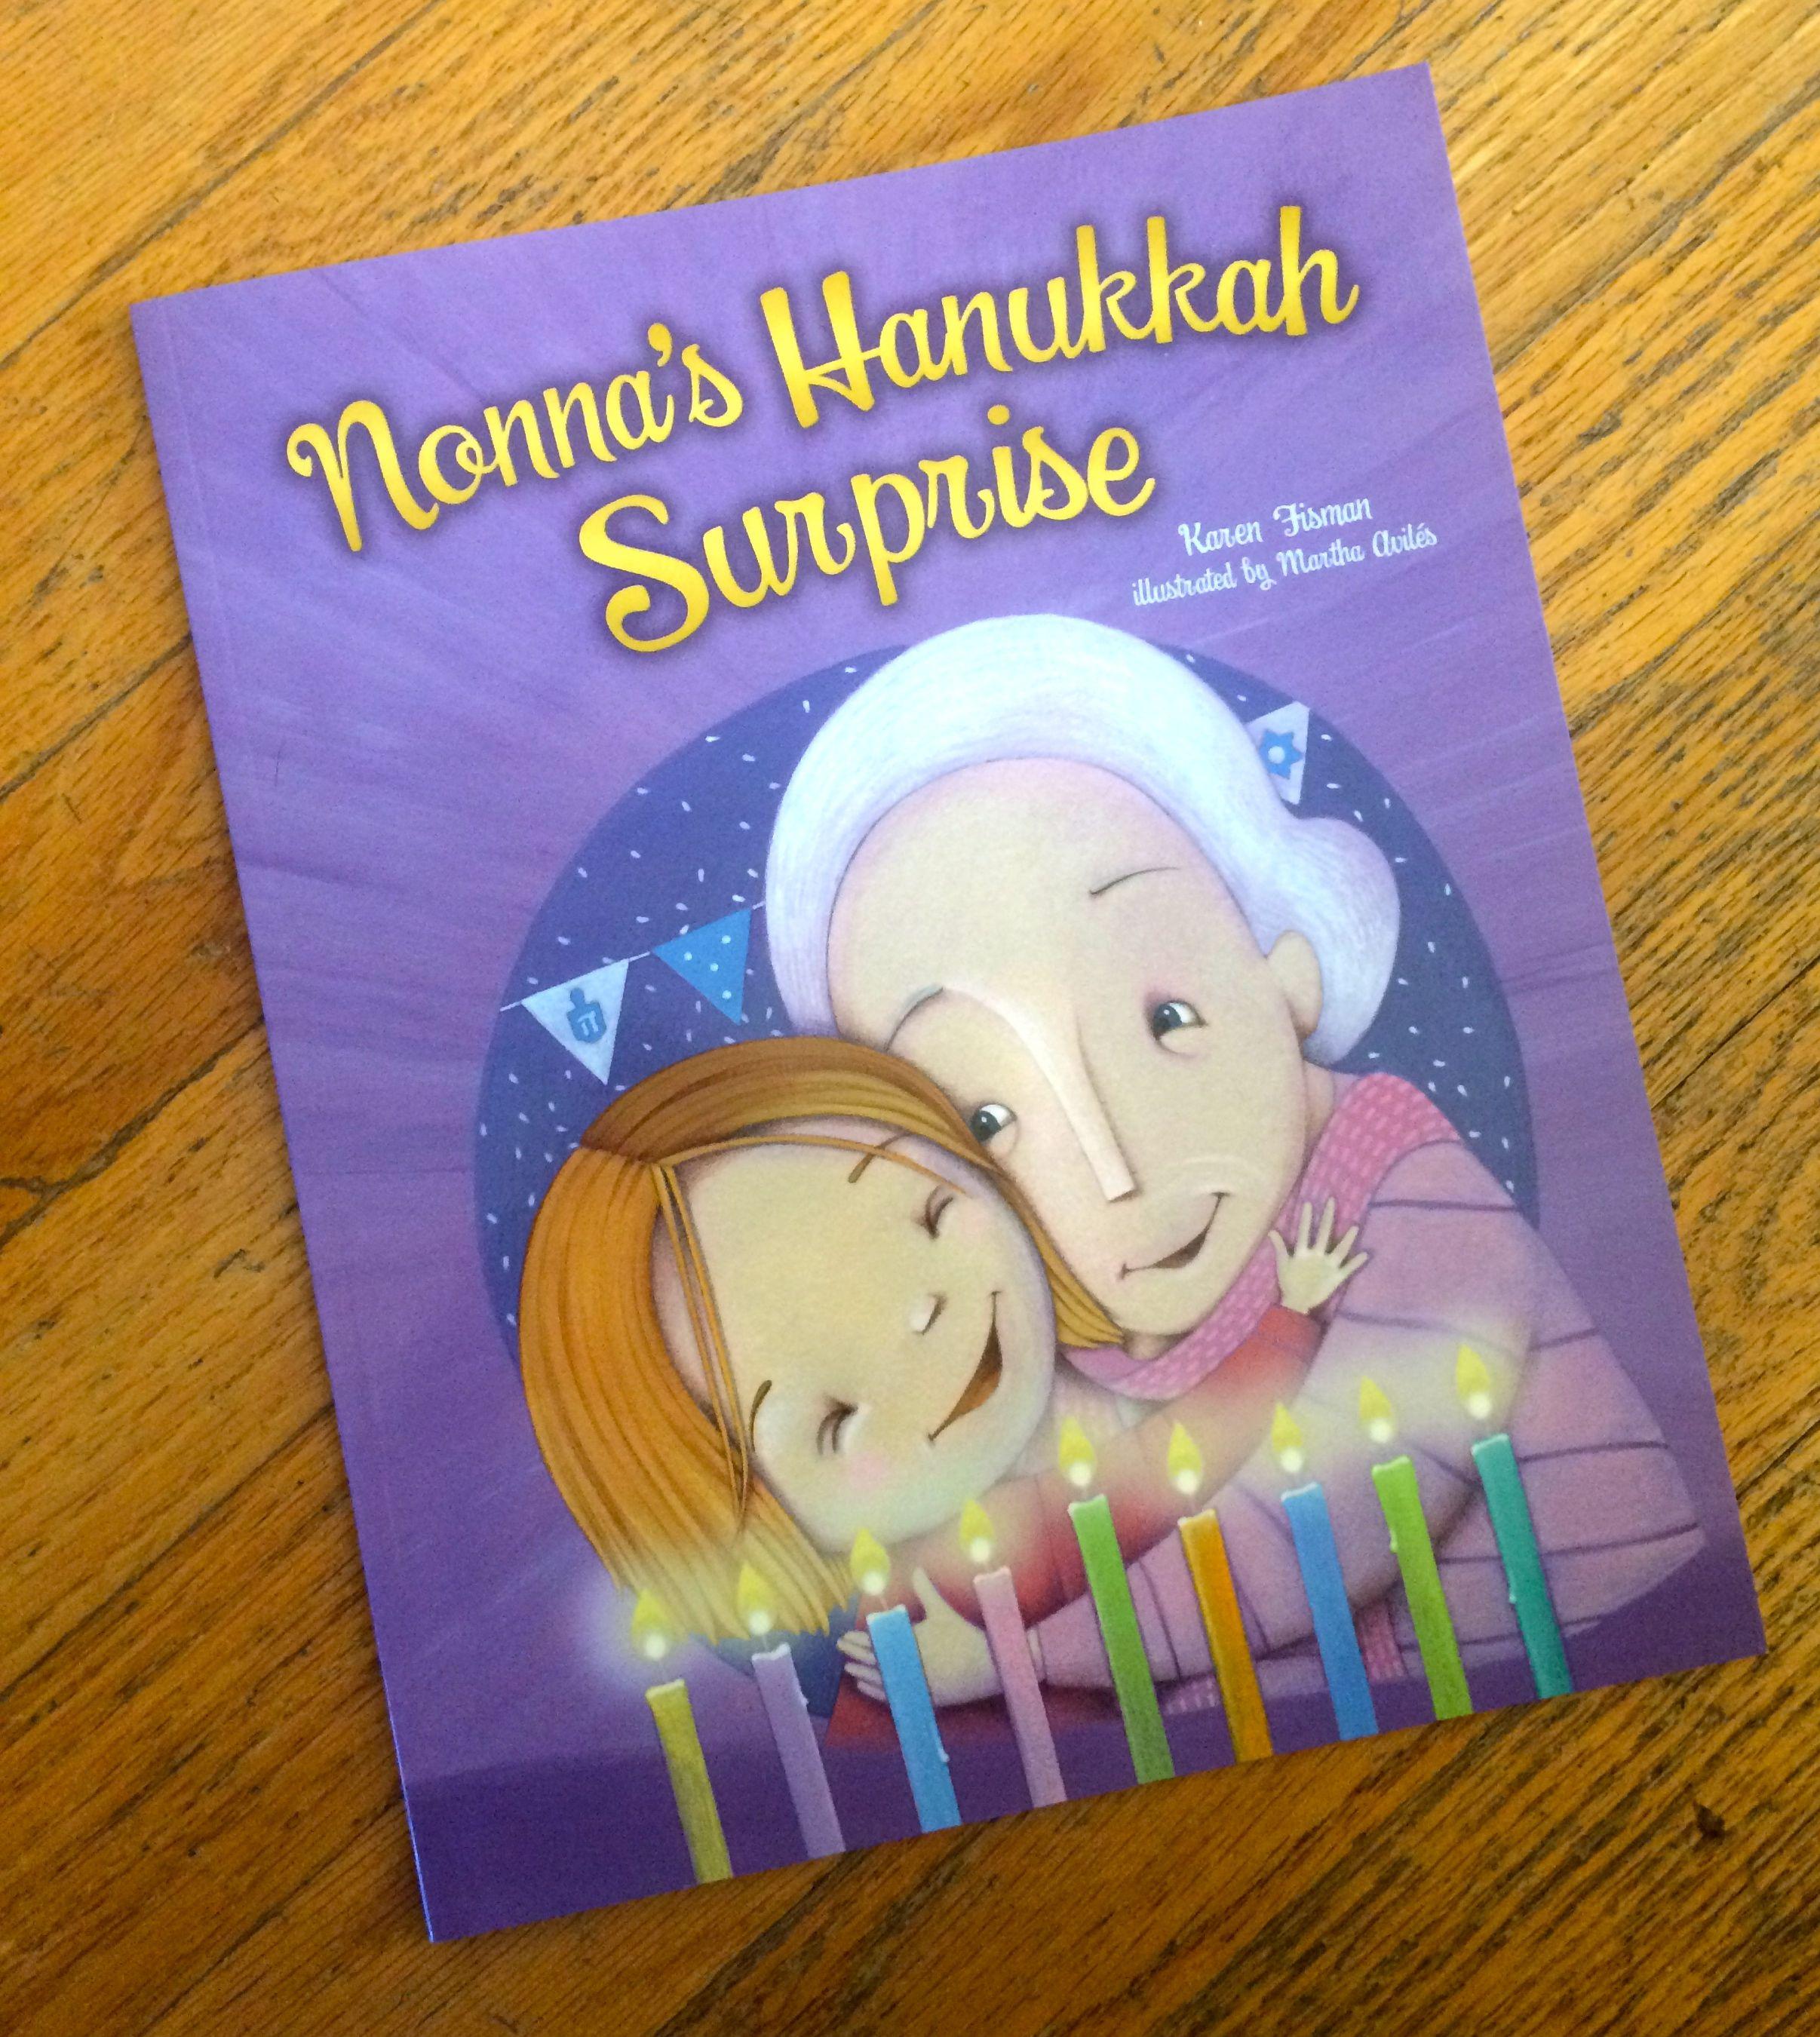 Books for interfaith children at Hanukkah and Christmas. Nonna's Hanukkah Surprise.